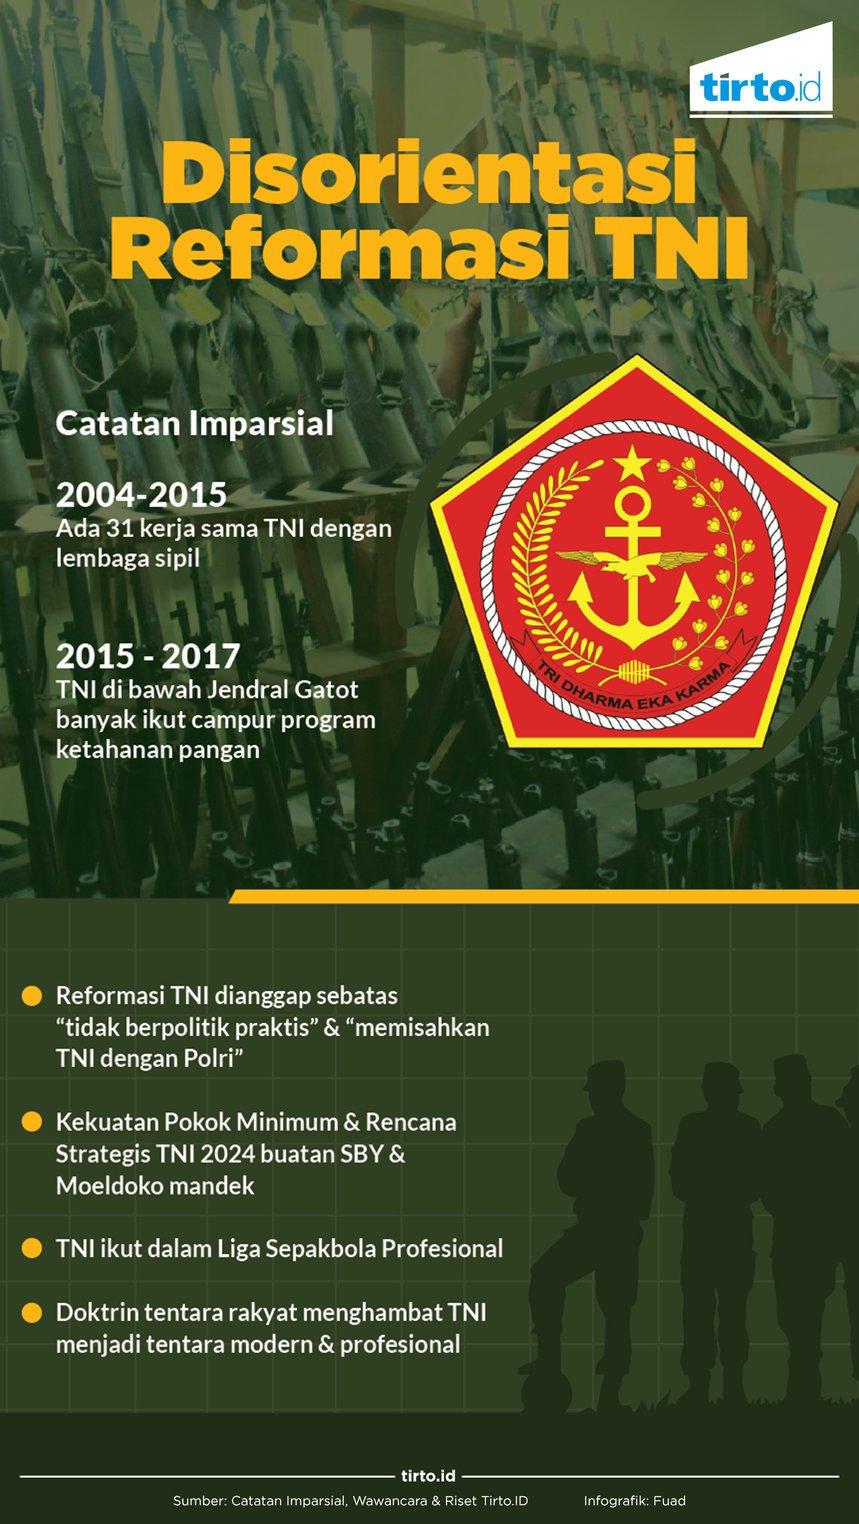 "Warga Kampung Dadap, Tangerang: ""Laporkan Intimidasi TNI ke Komnas HAM"""